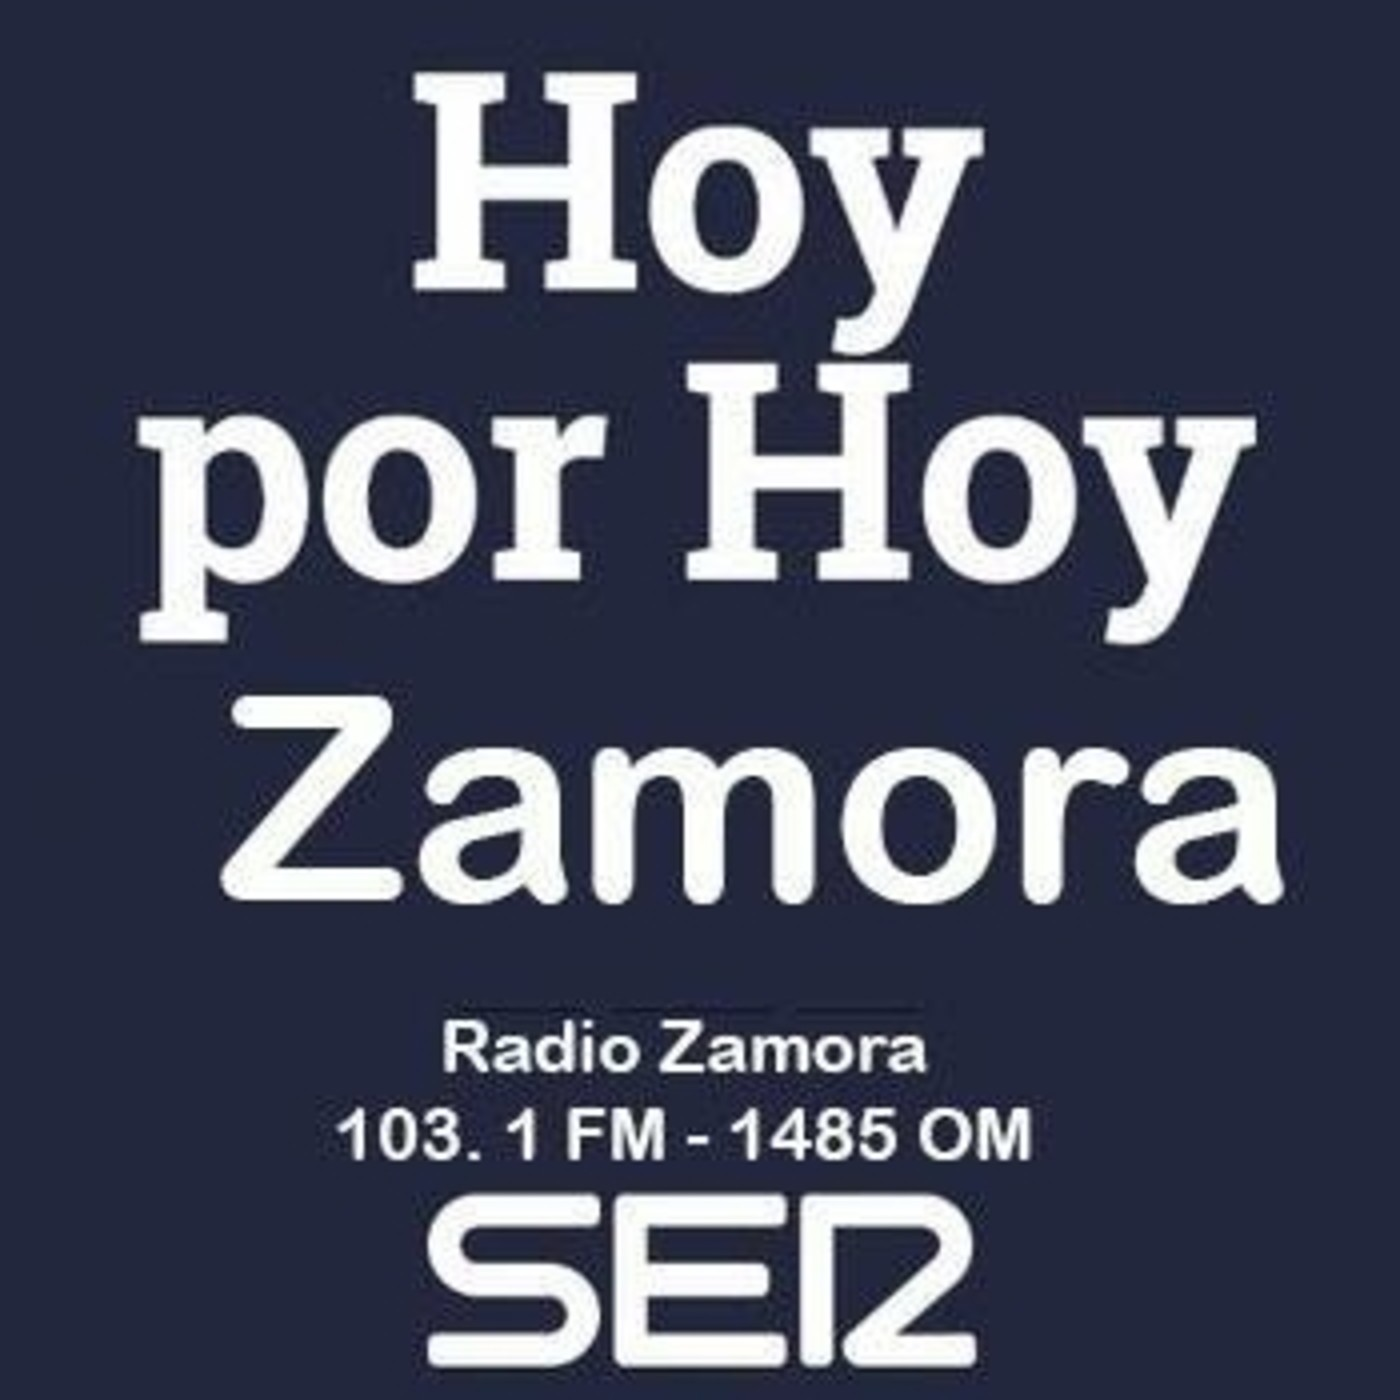 Hoy por hoy Zamora y Benavente (10/09/2020) Primer Tramo